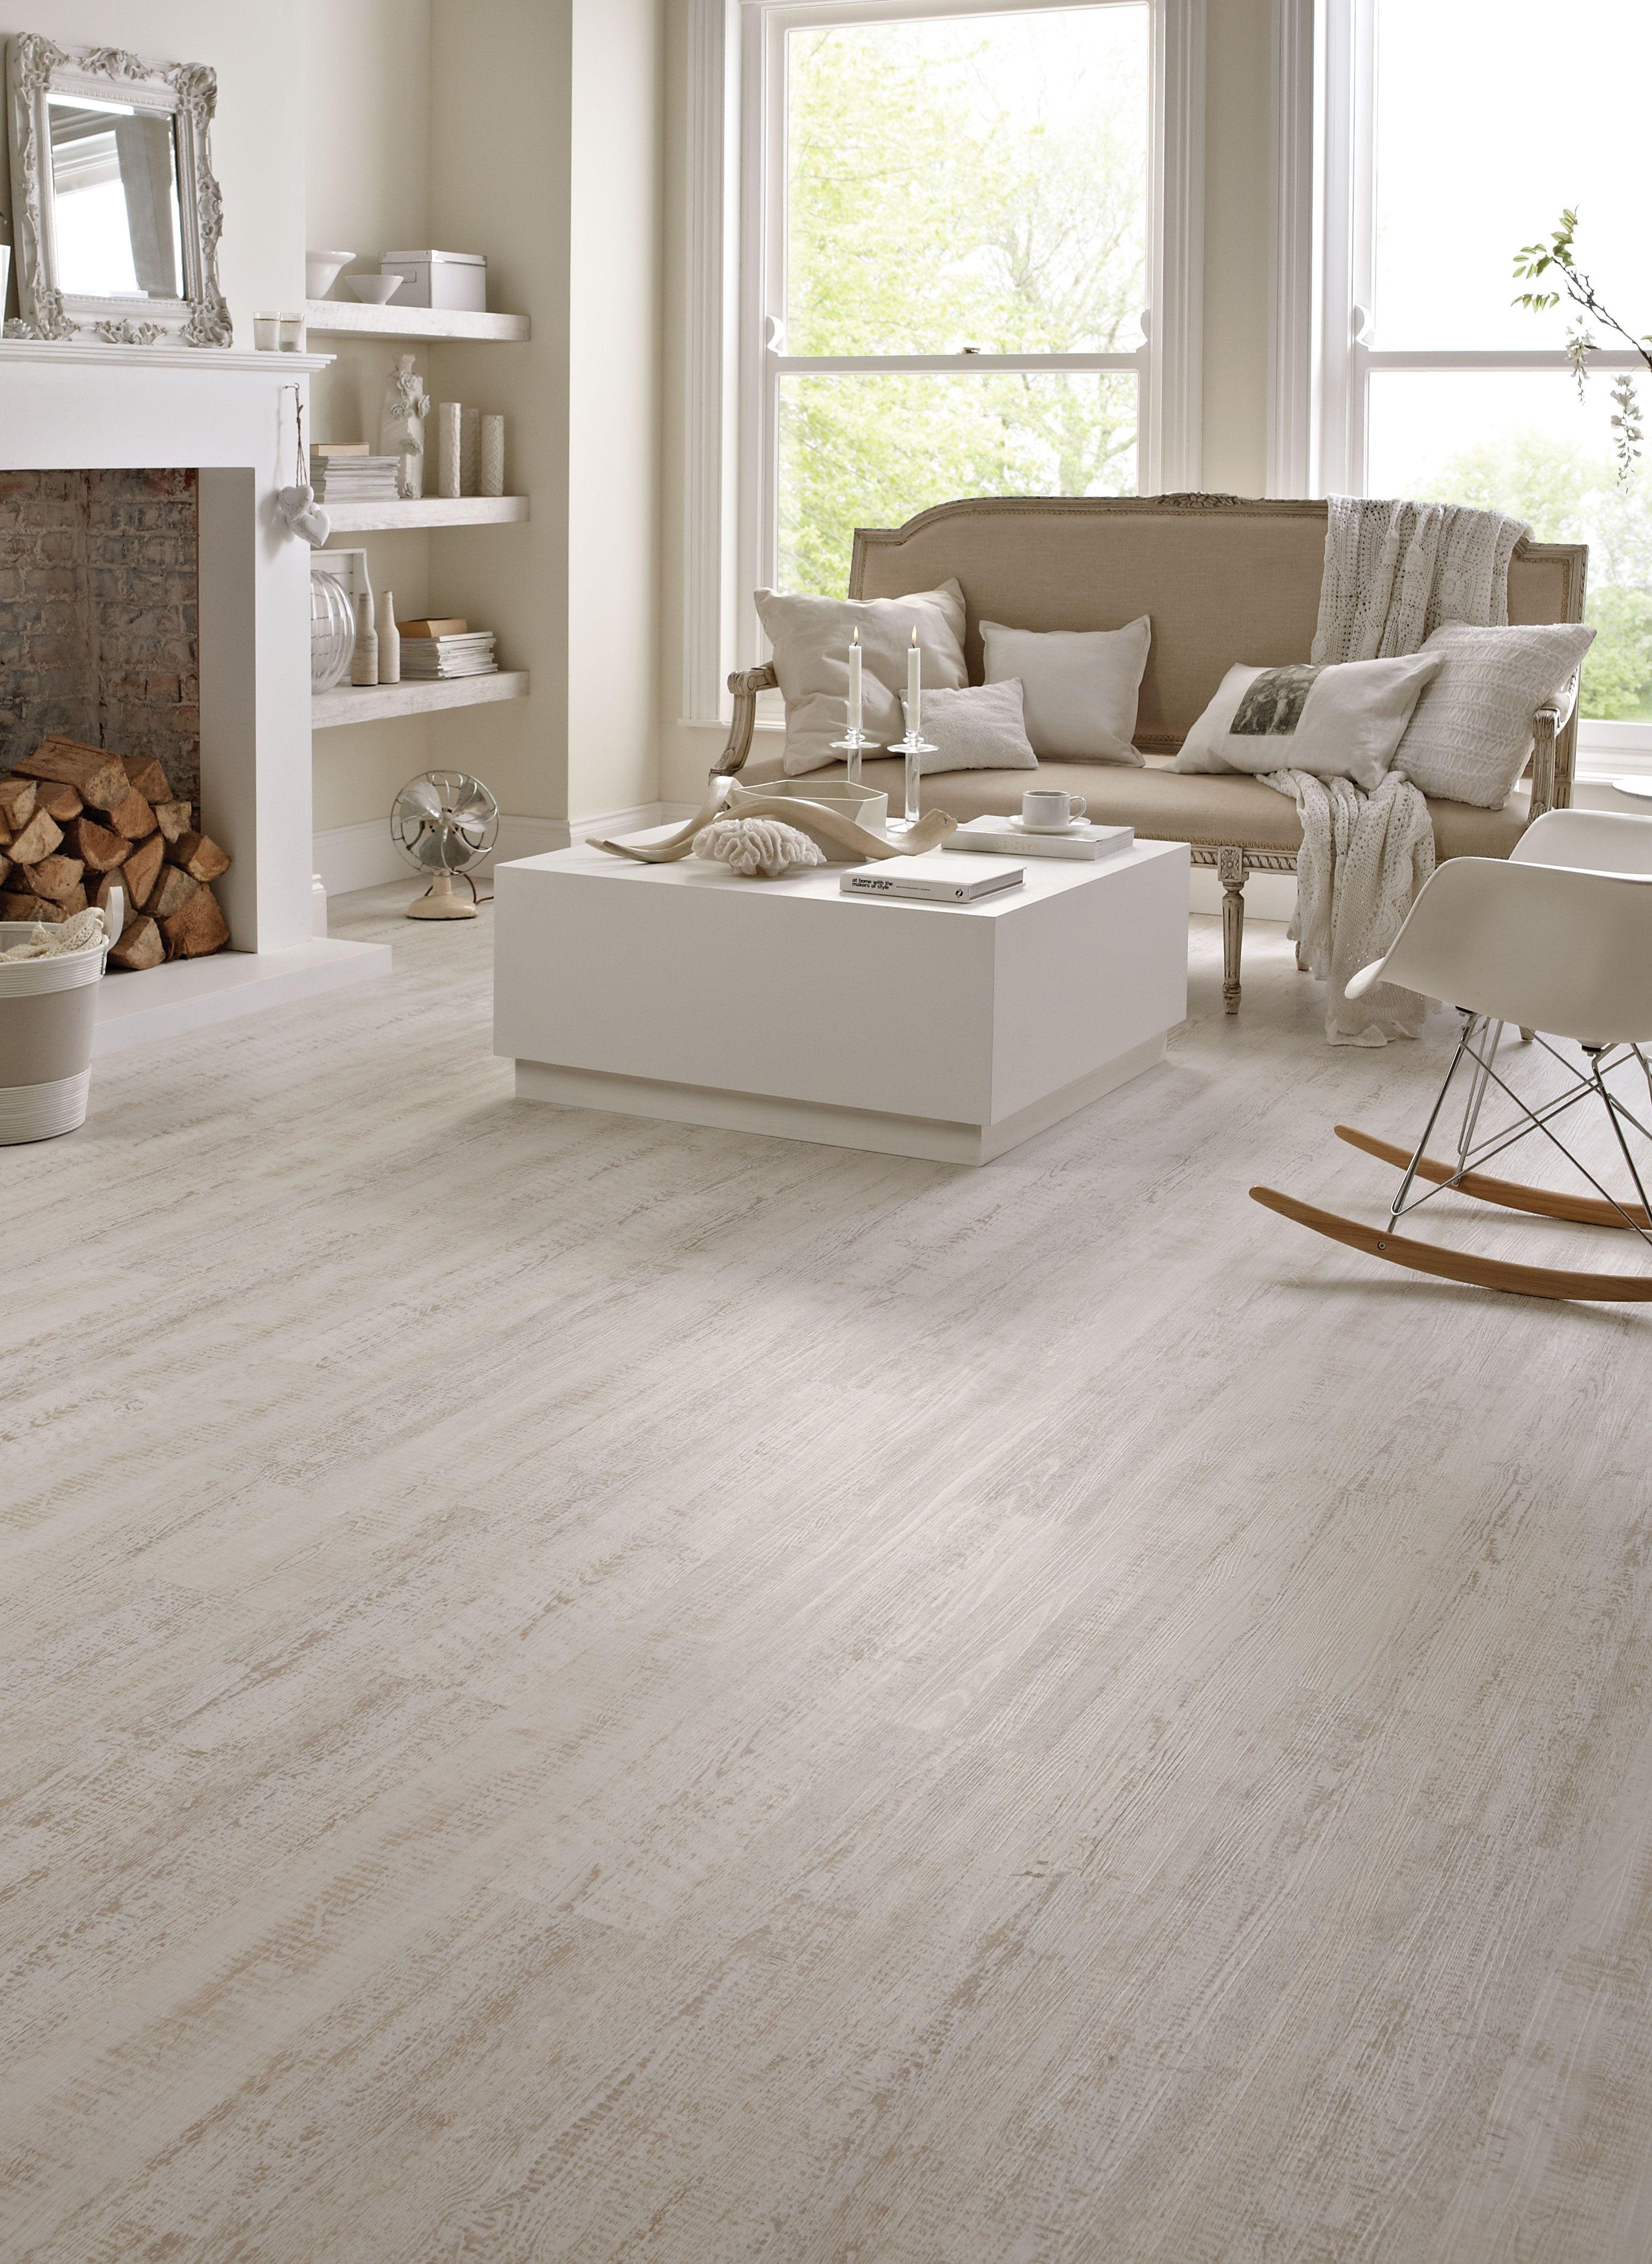 sanding painted hardwood floors of karndean wood flooring white painted oak by karndeanfloors throughout karndean wood flooring white painted oak by karndeanfloors available from rodgers of york flooring interiors